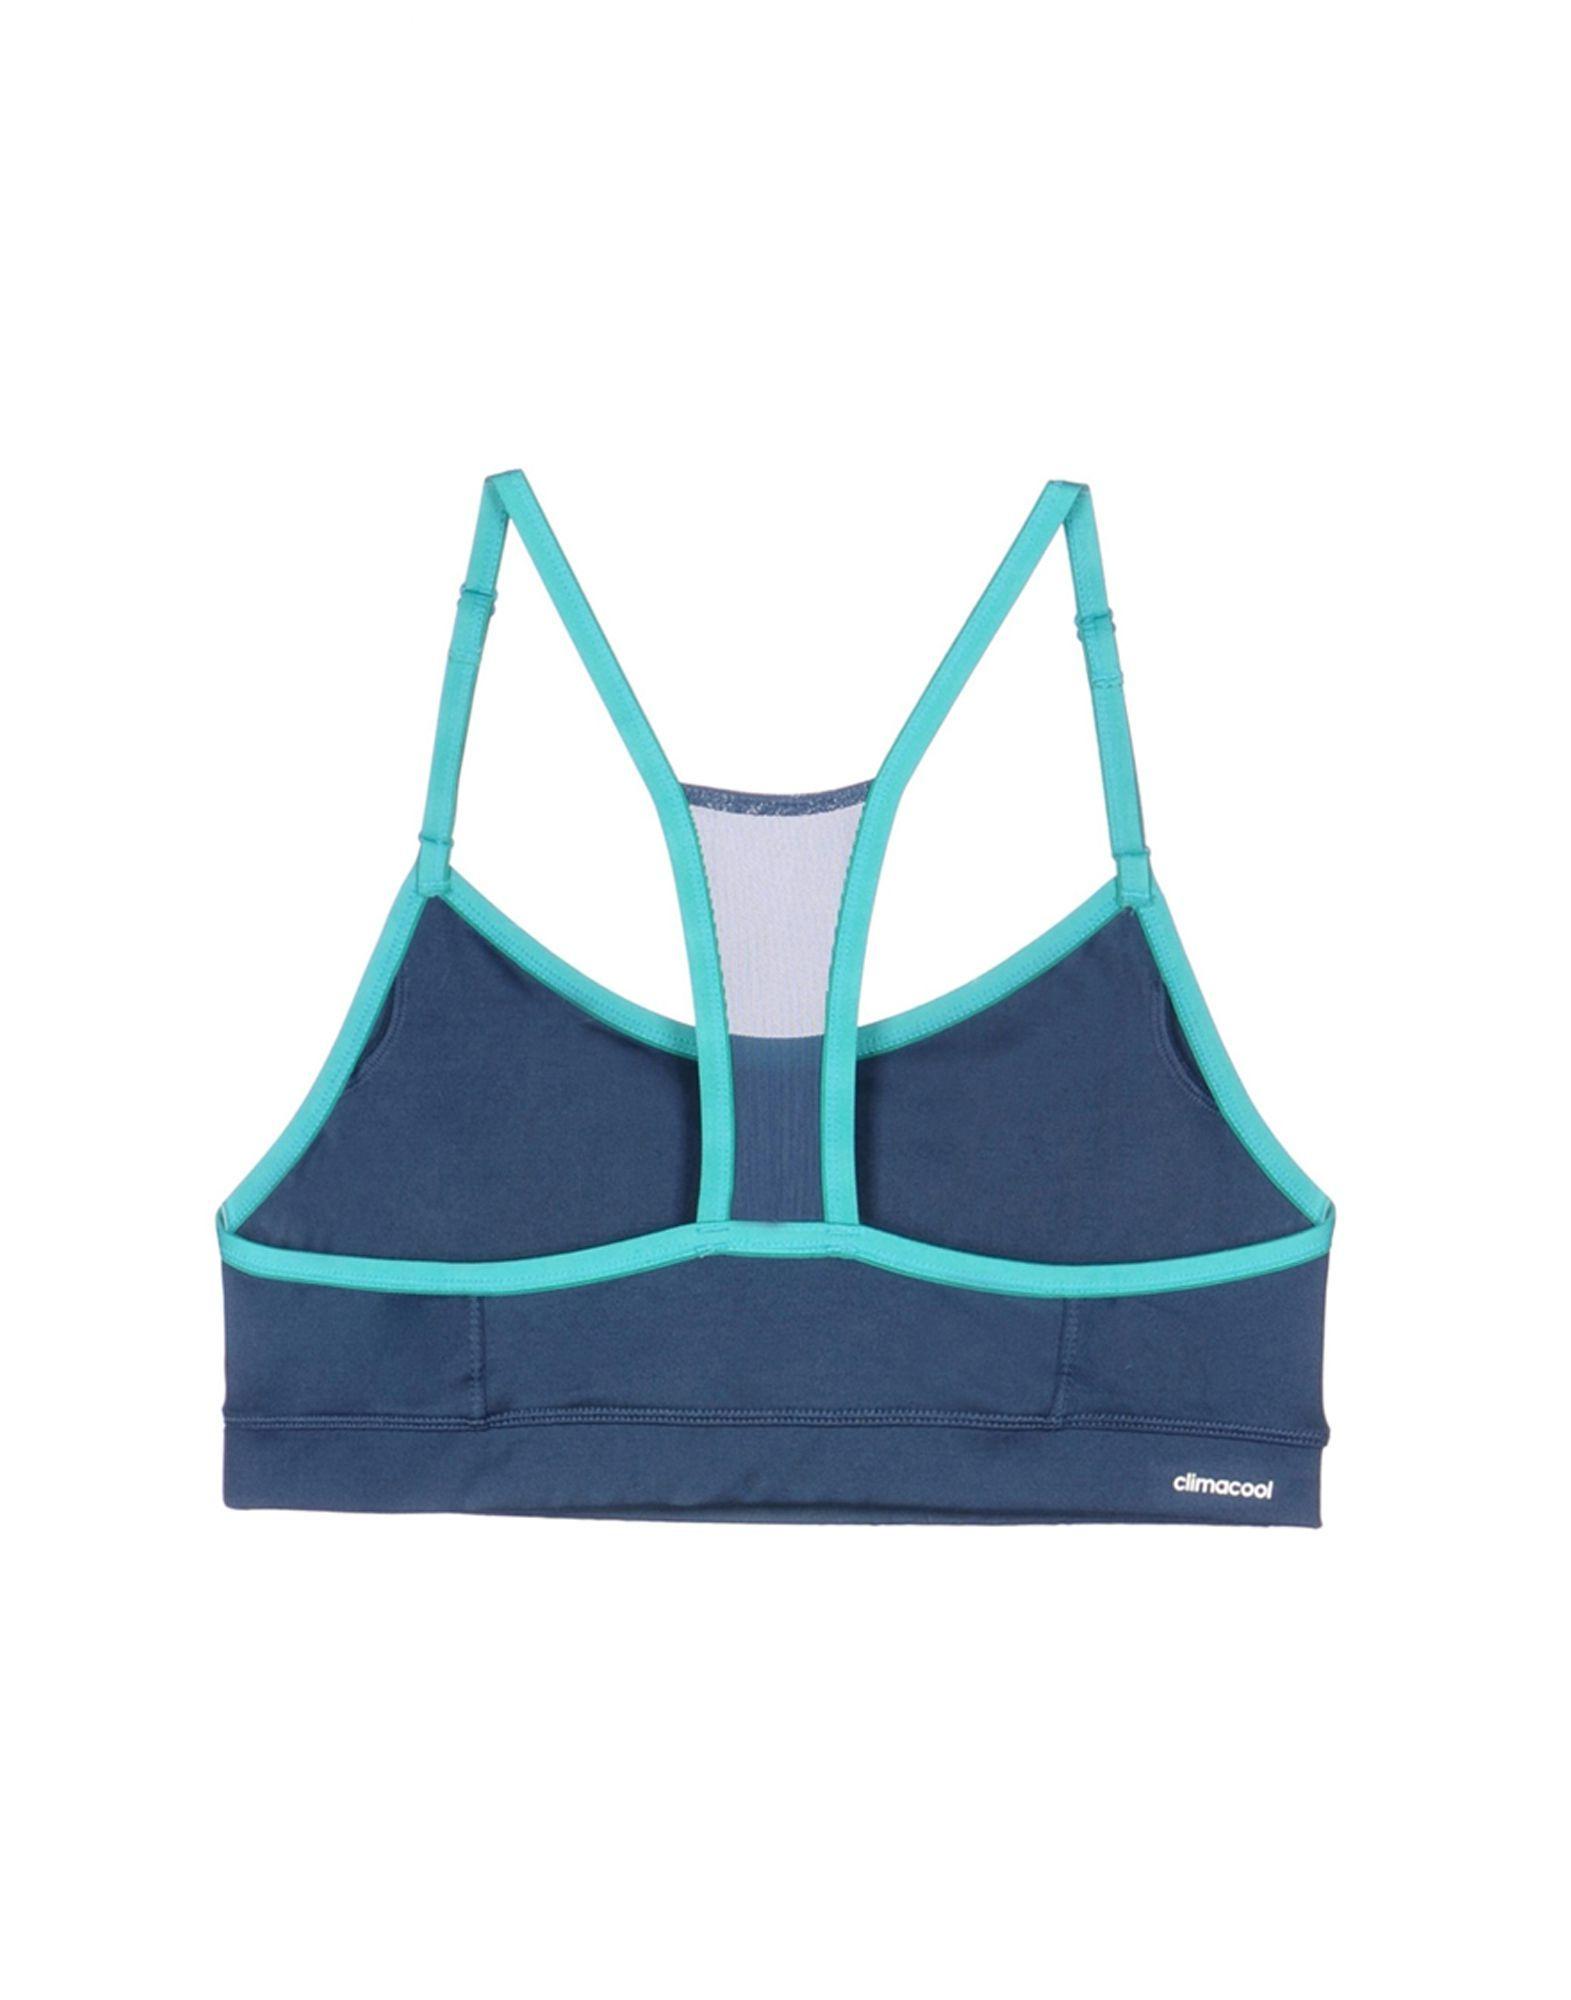 Adidas Woman Slate blue Tops